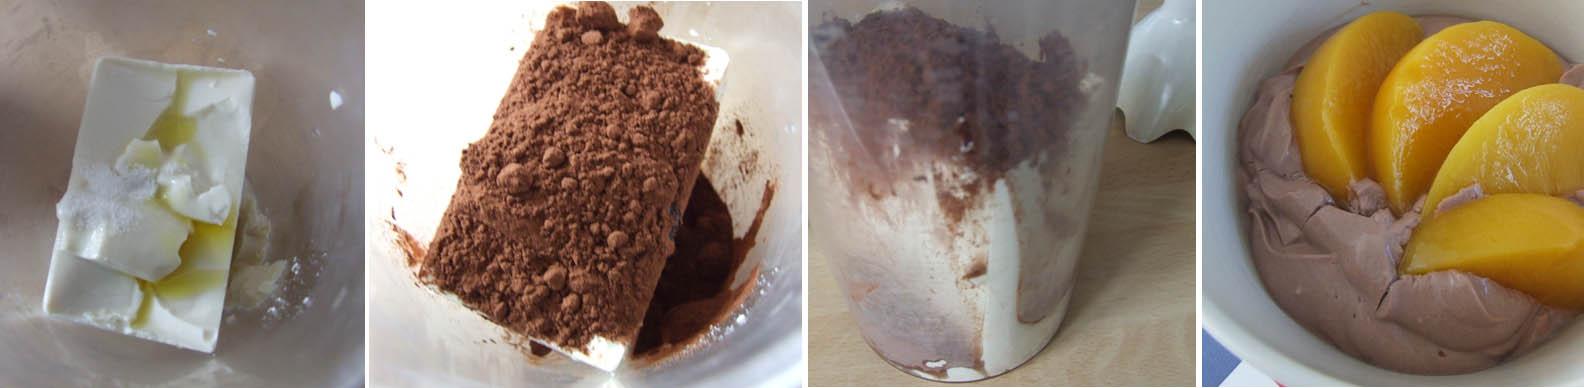 Silky chocolate orange tofu dessert with Stevia